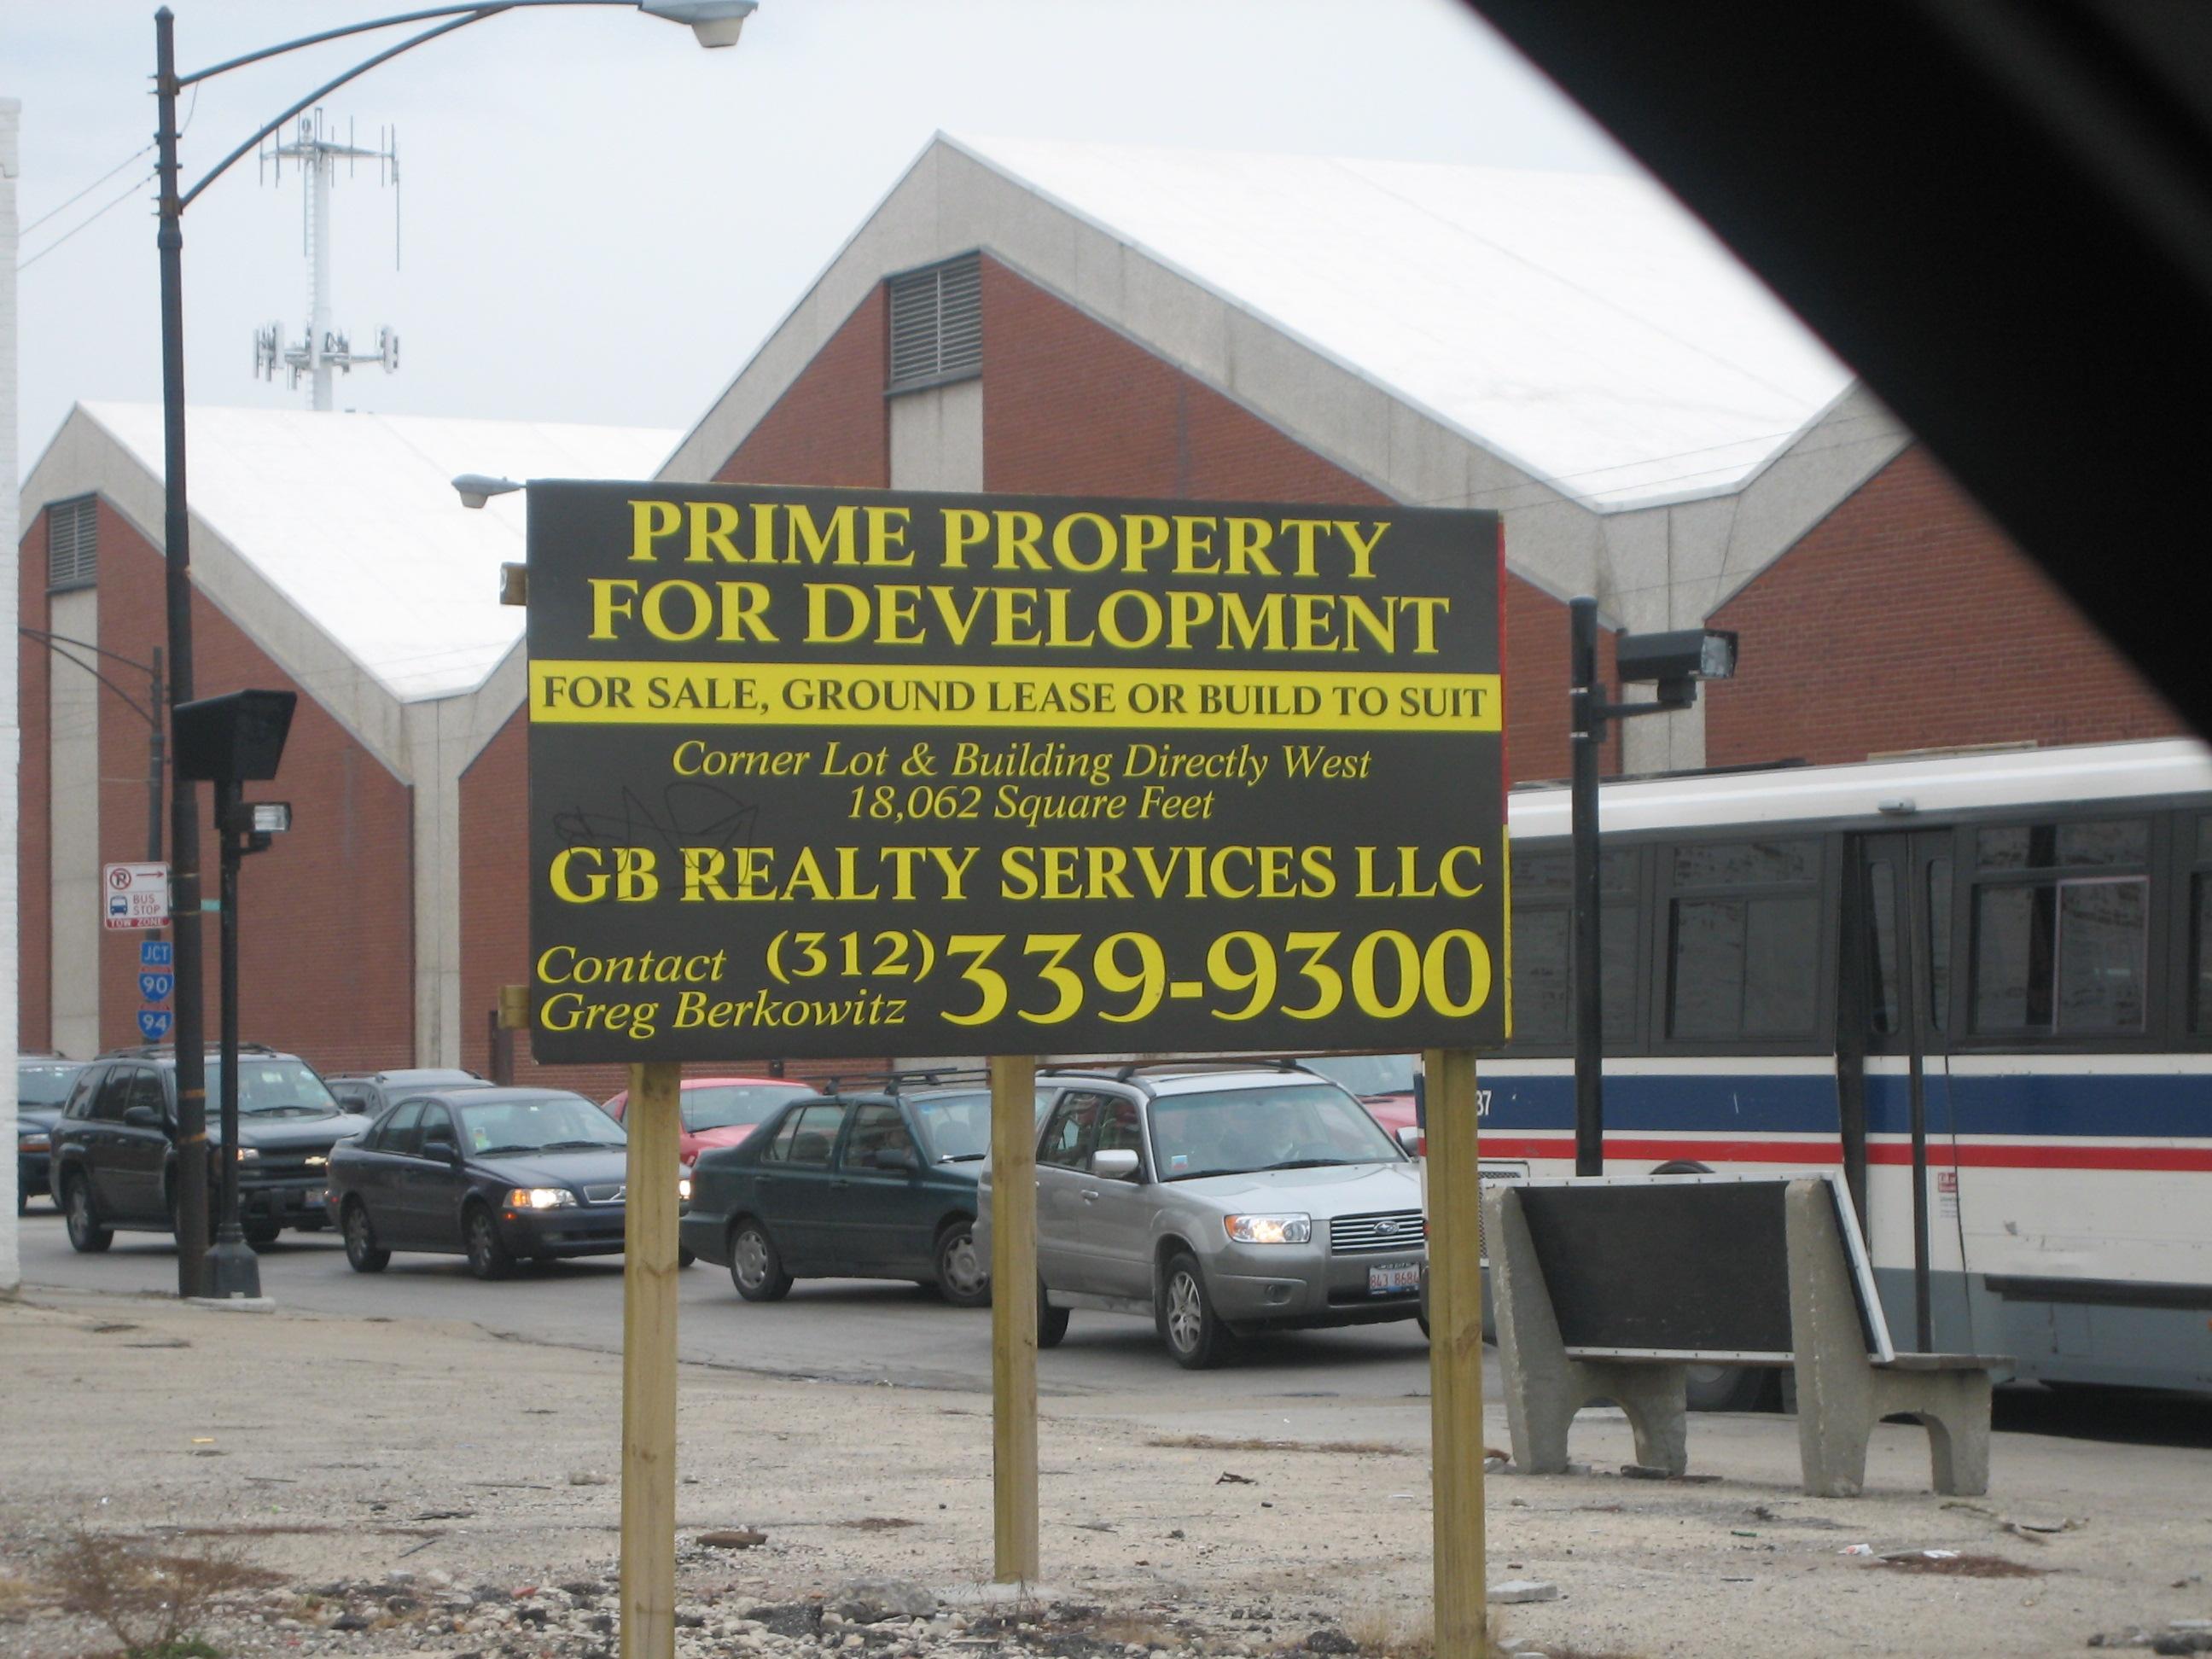 Prime spot in Bucktown